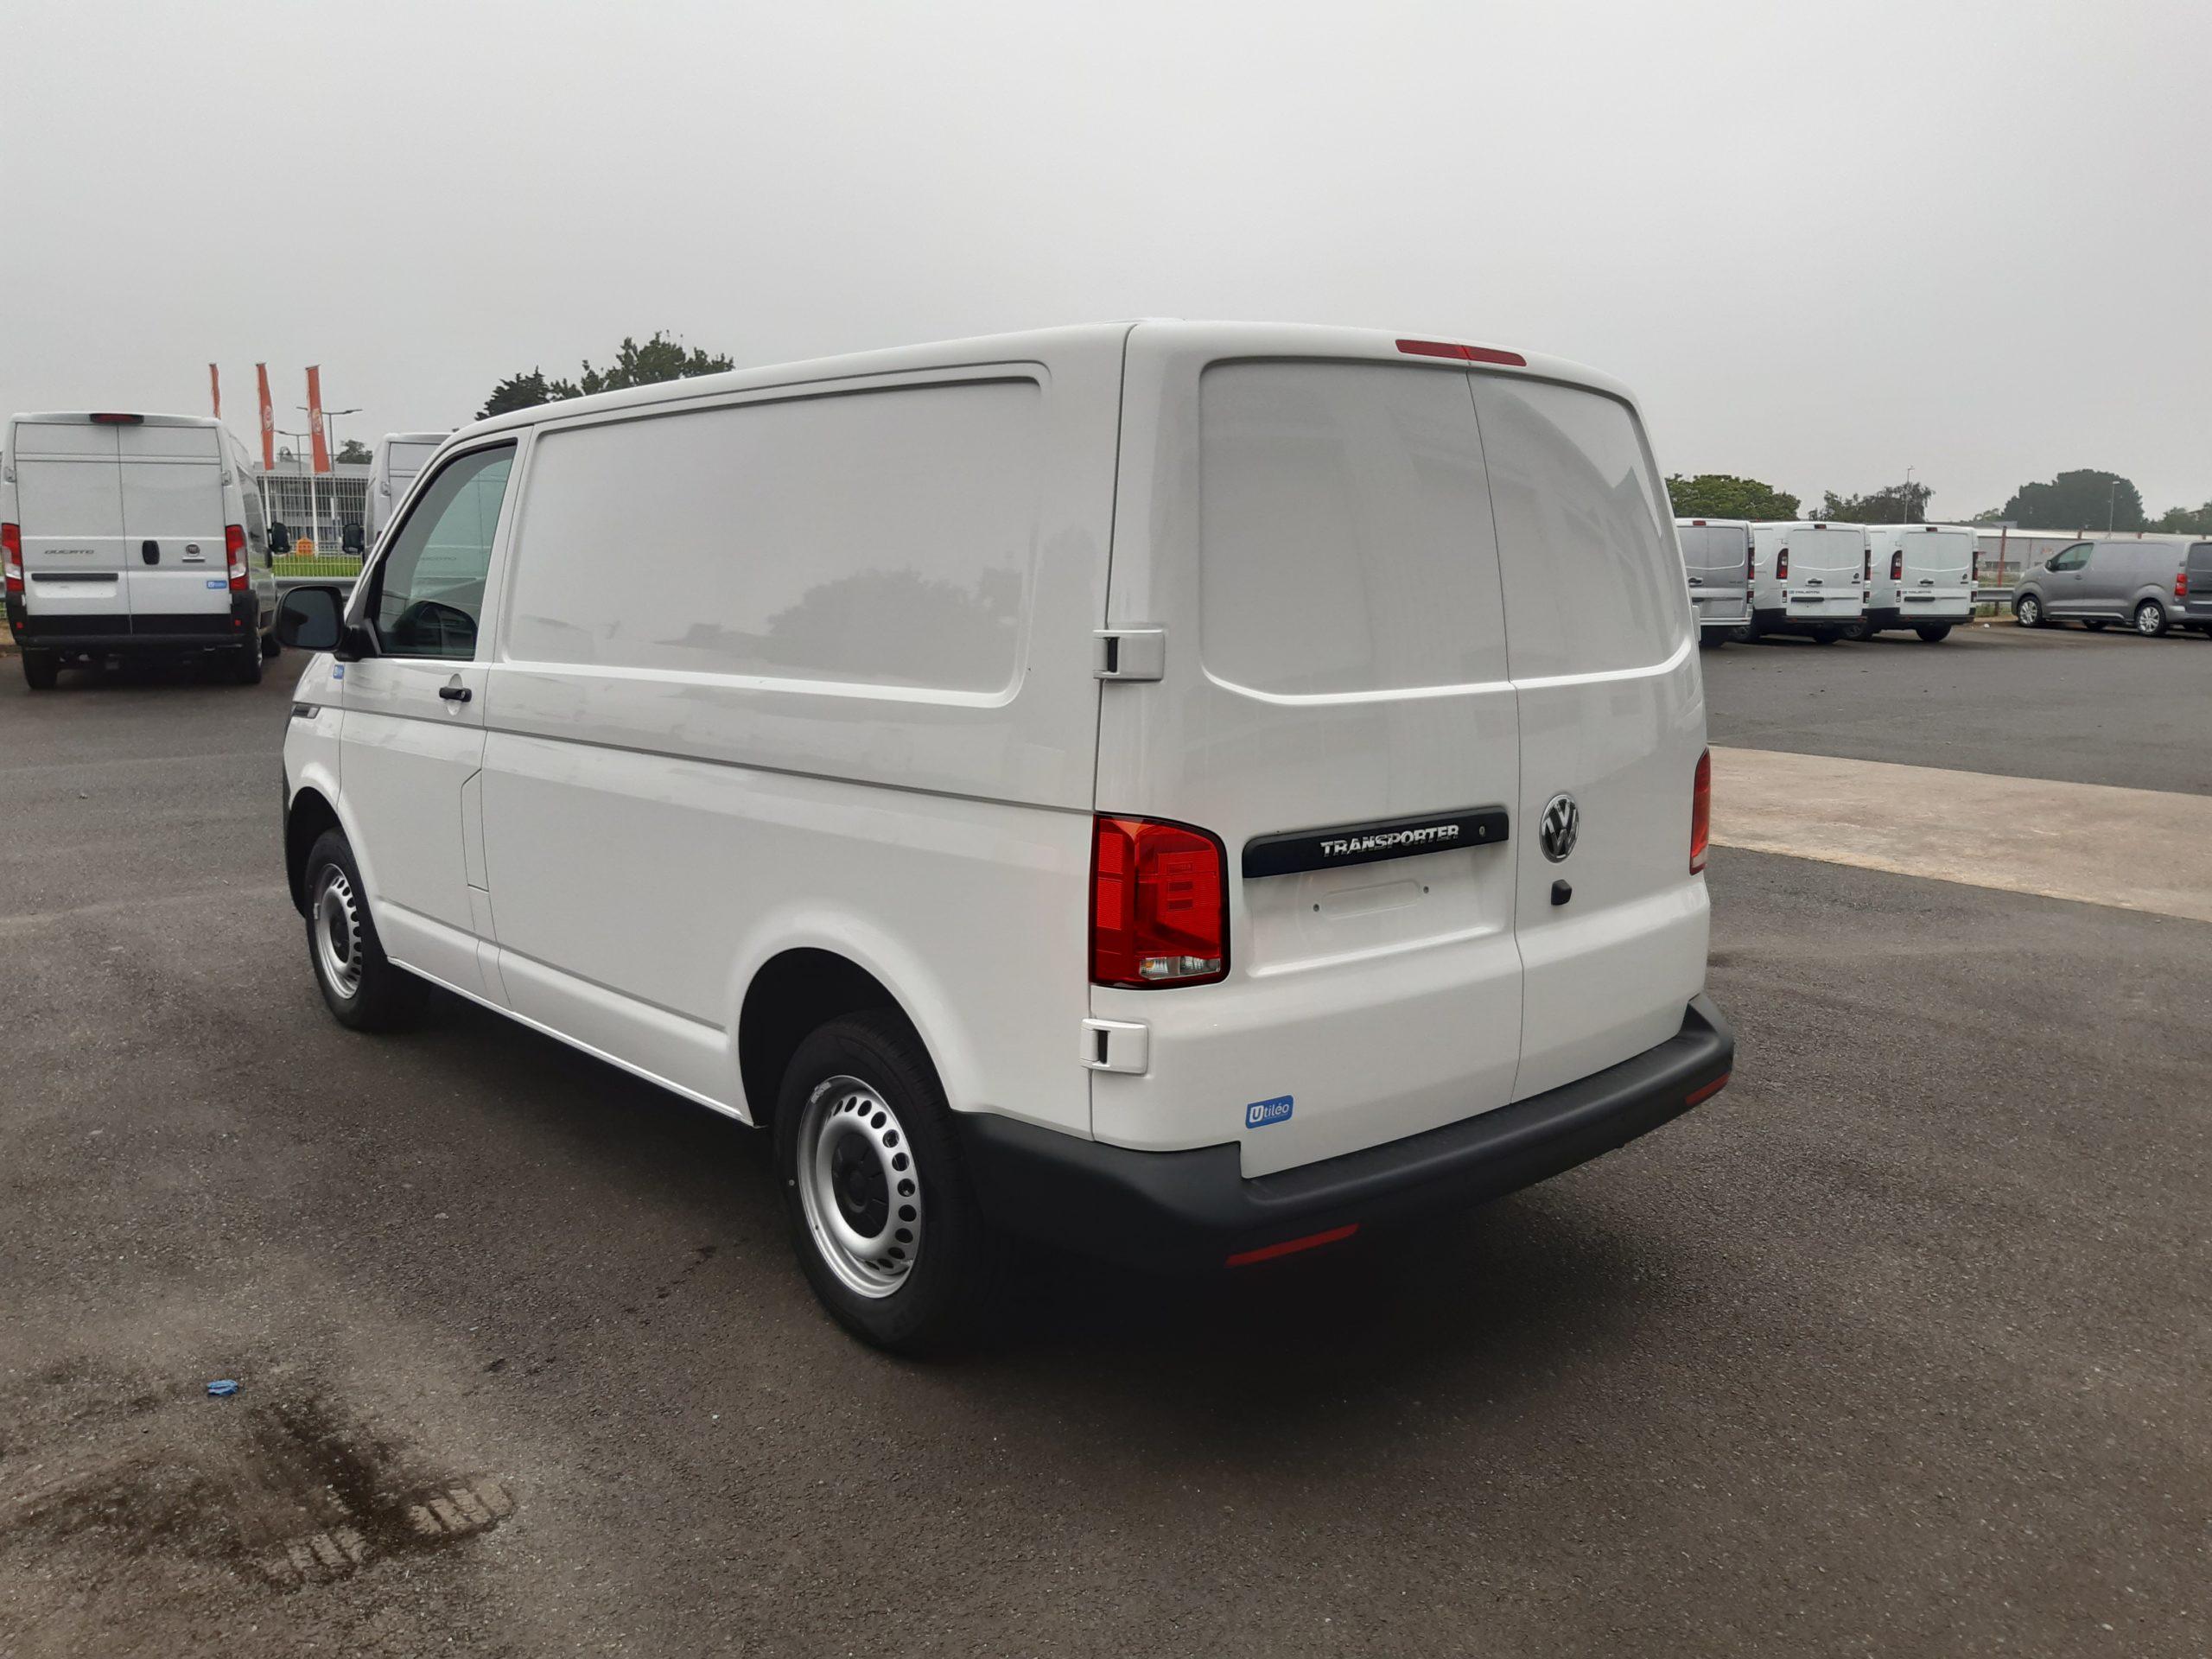 Location d'un fourgon compact double cabine - Volkswagen Transporter T6-1 - Vue5